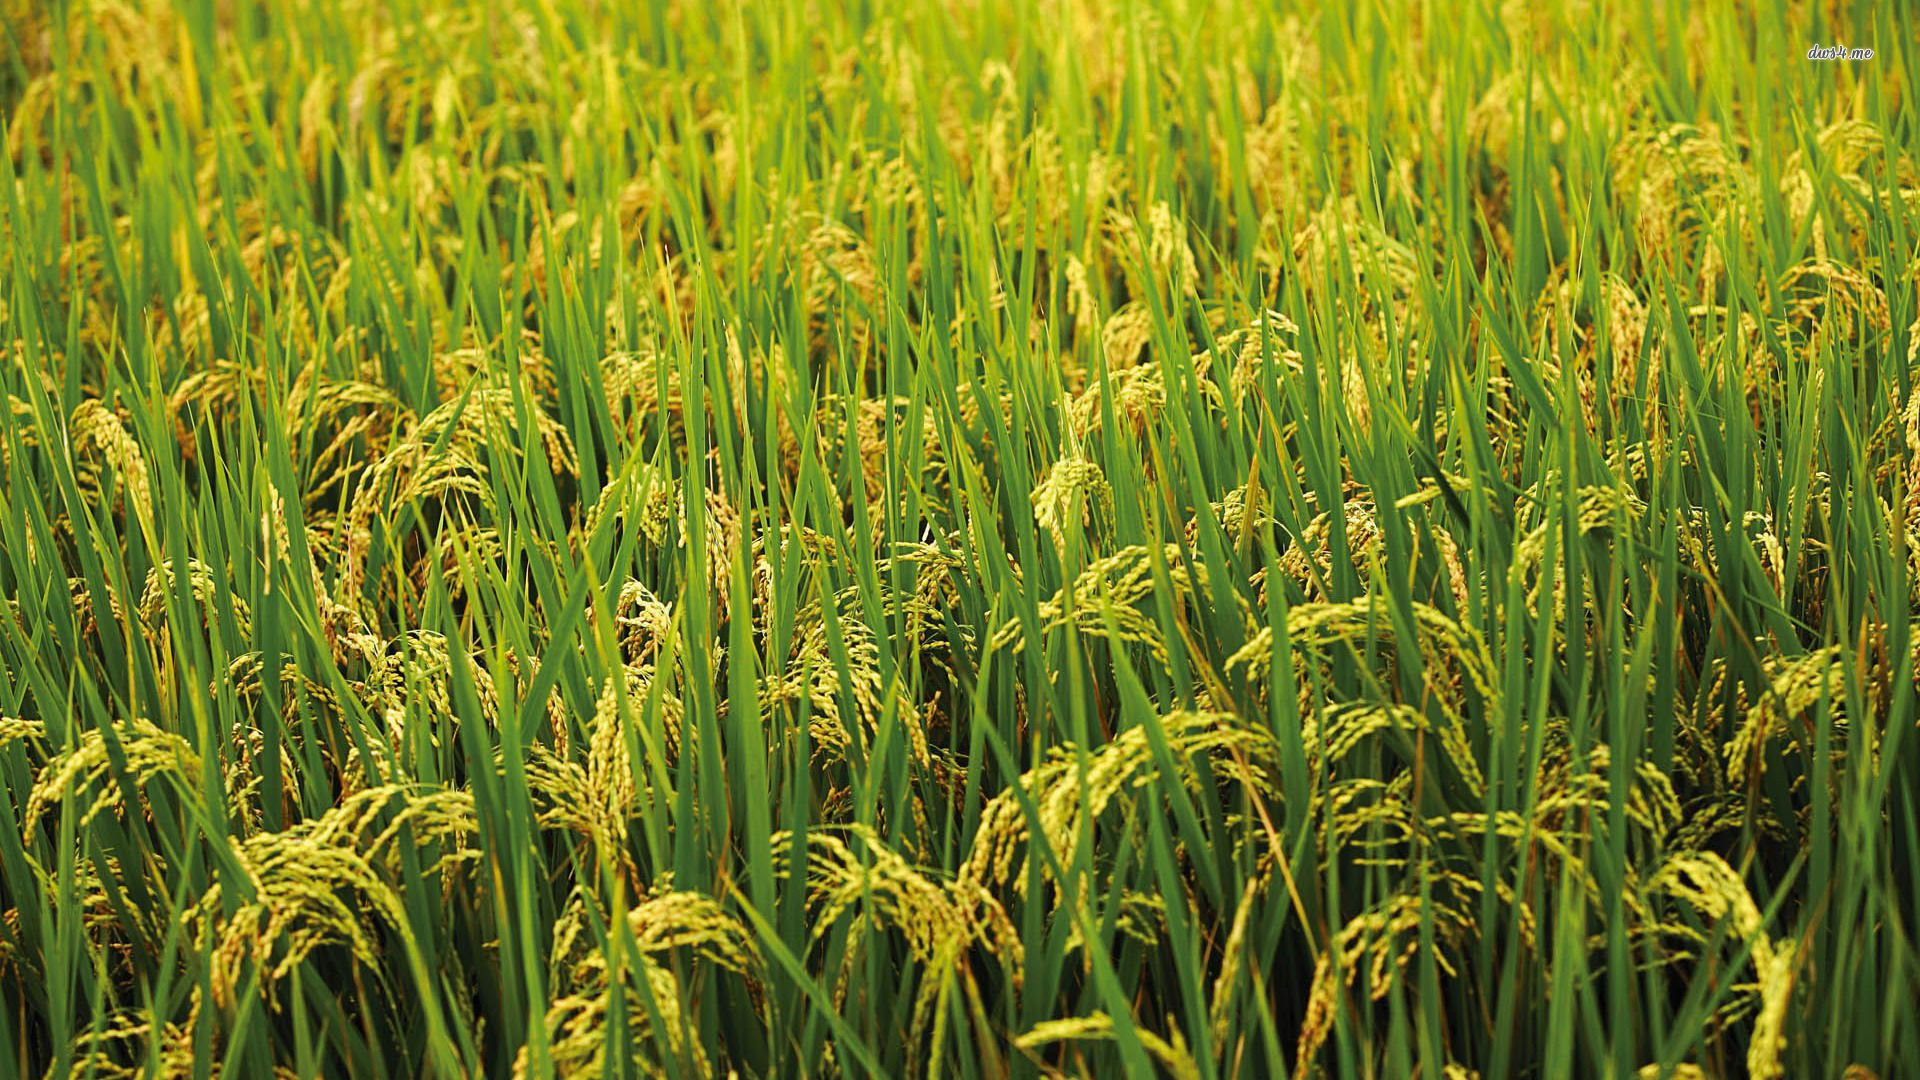 Rice wallpaper download